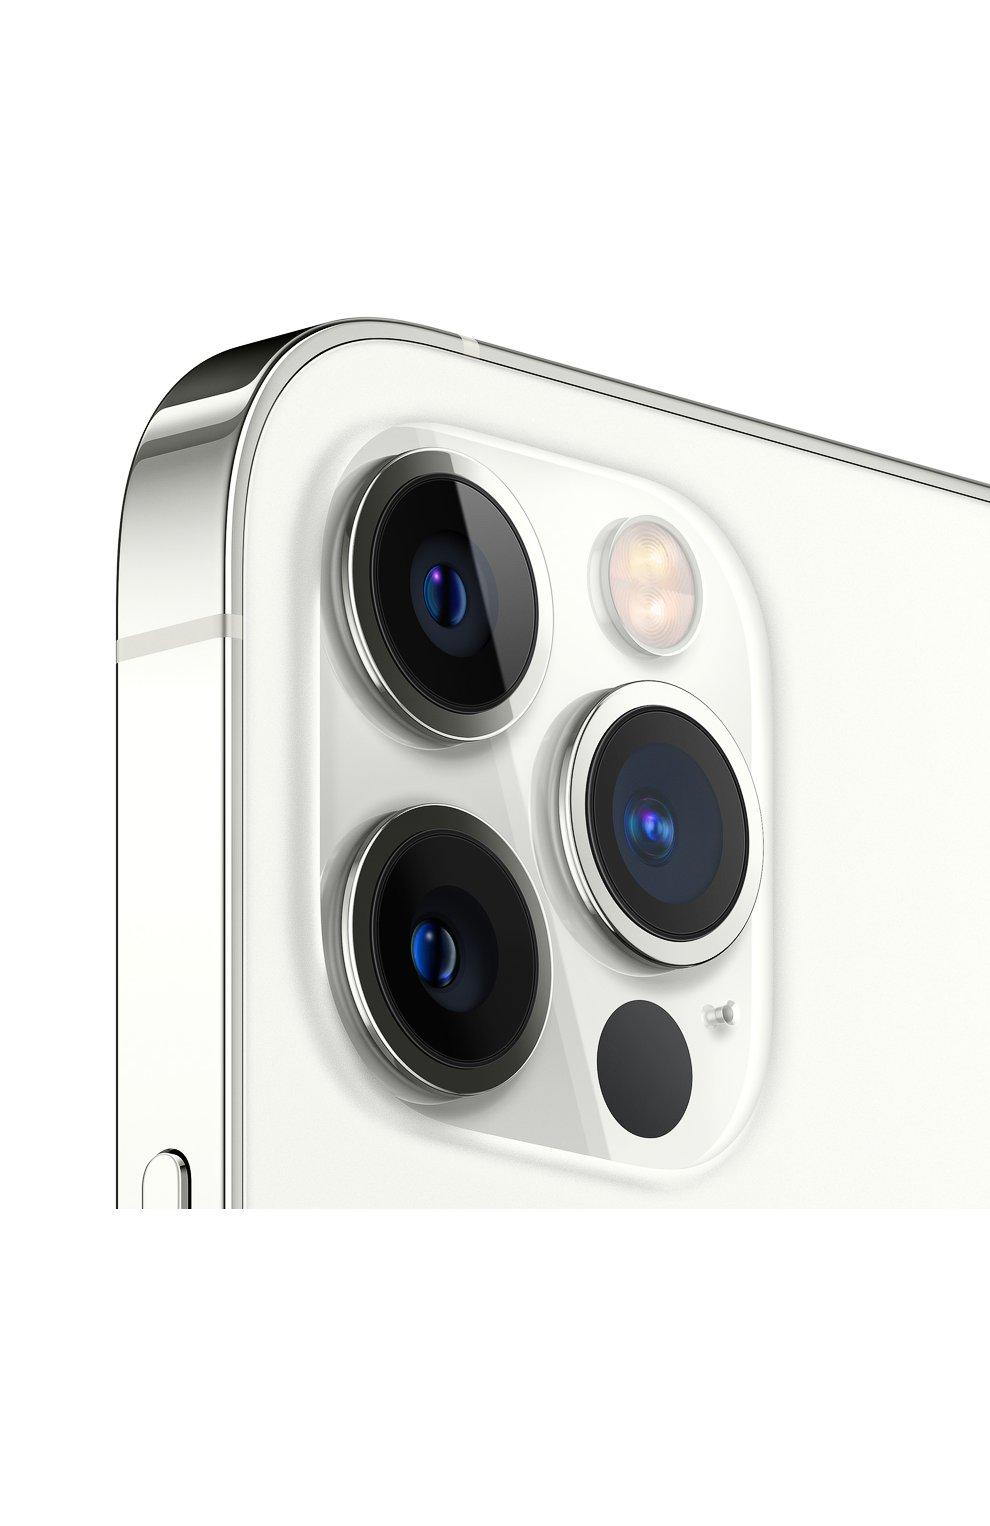 Iphone 12 pro 256gb silver APPLE  silver цвета, арт. MGMQ3RU/A | Фото 3